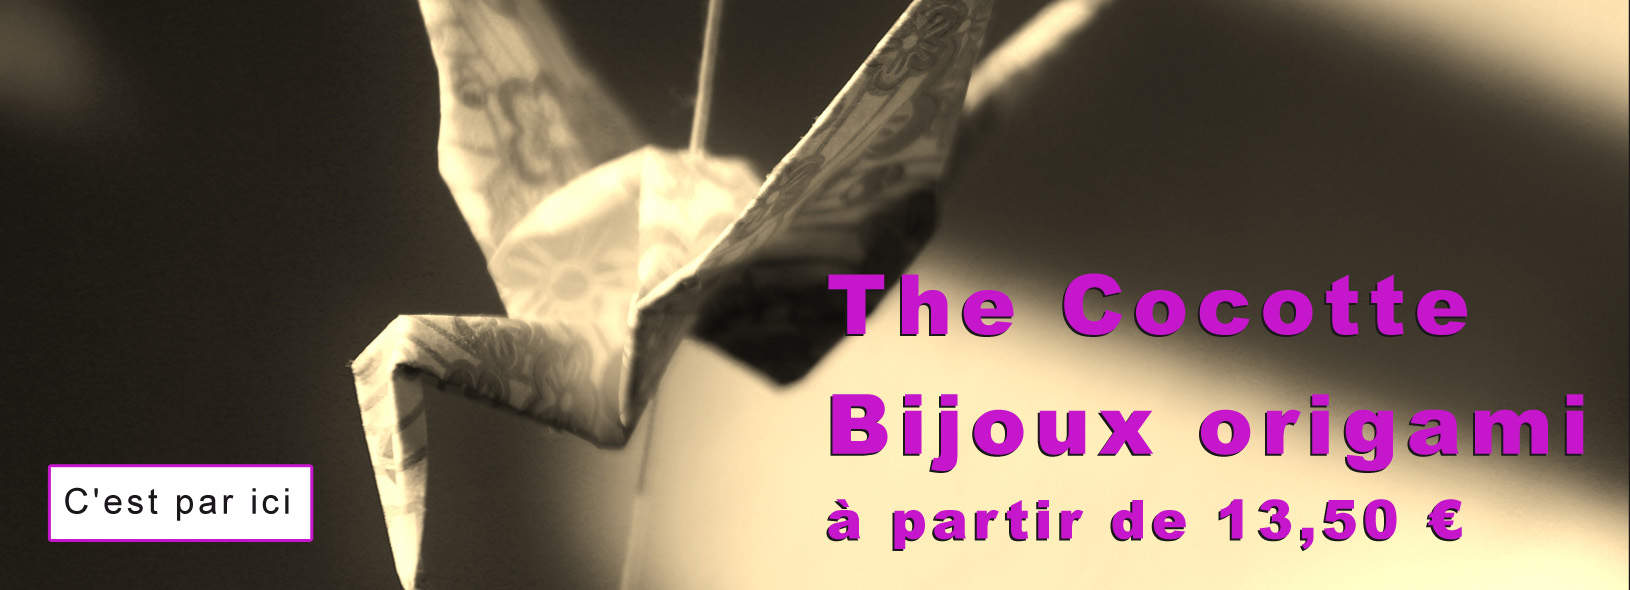 Bijou origami the cocotte